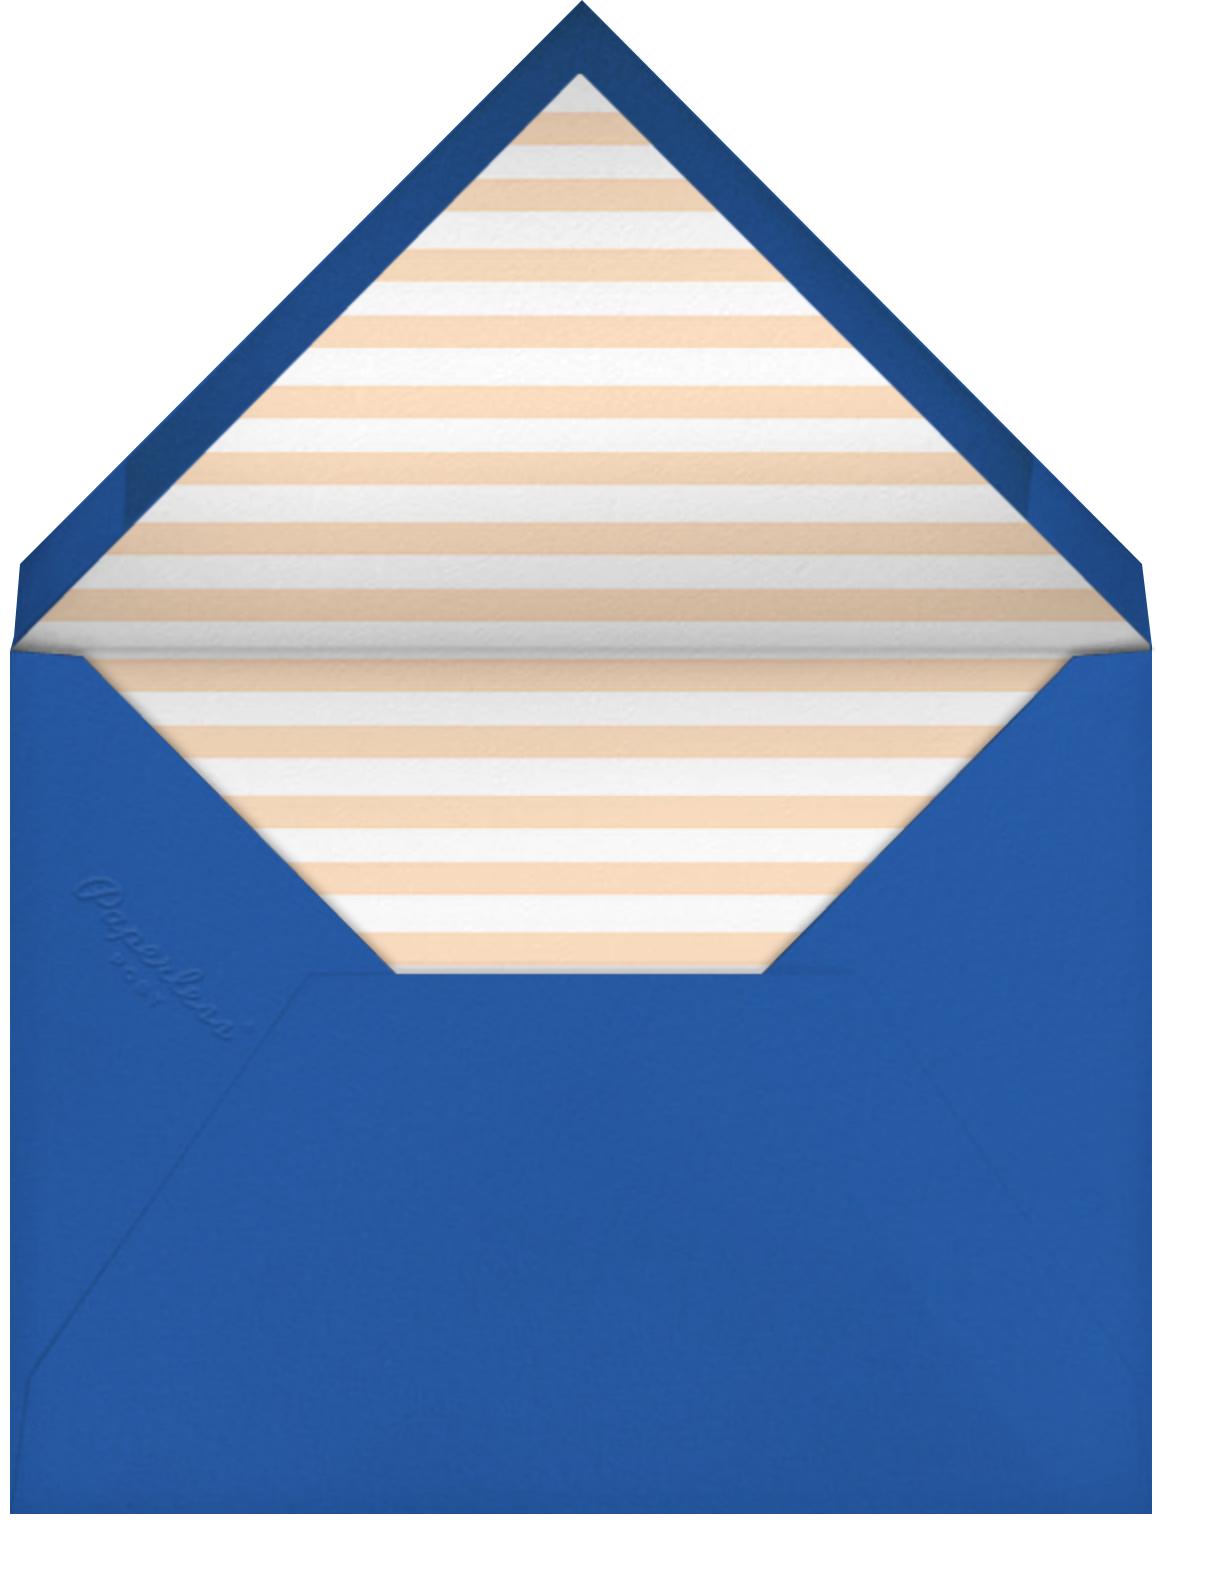 A Bear in the Tent (Photo) - Blue - Mr. Boddington's Studio - Kids' birthday - envelope back